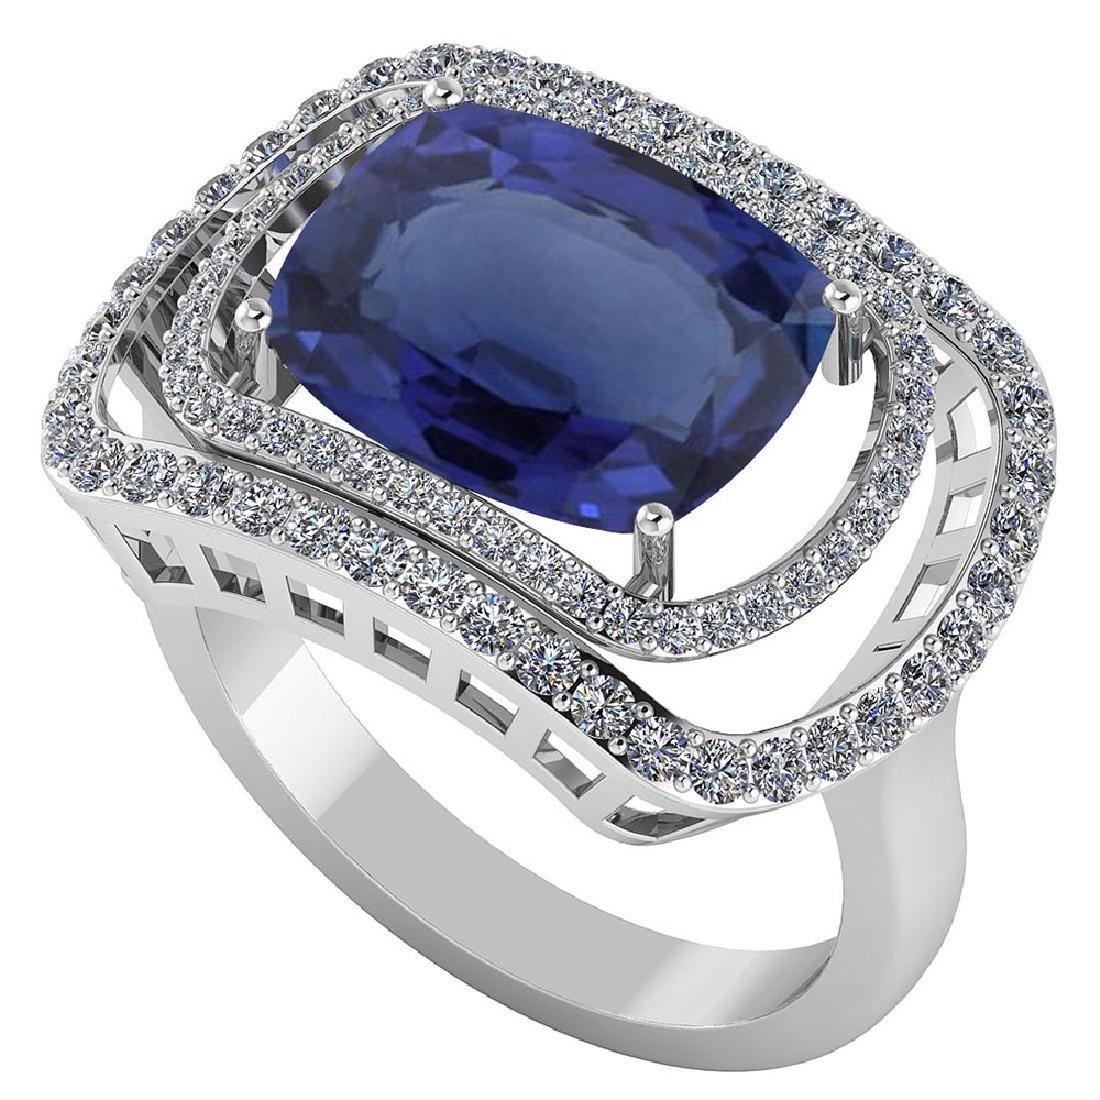 Certified 3.84 CTW Genuine Blue Sapphire And Diamond 14